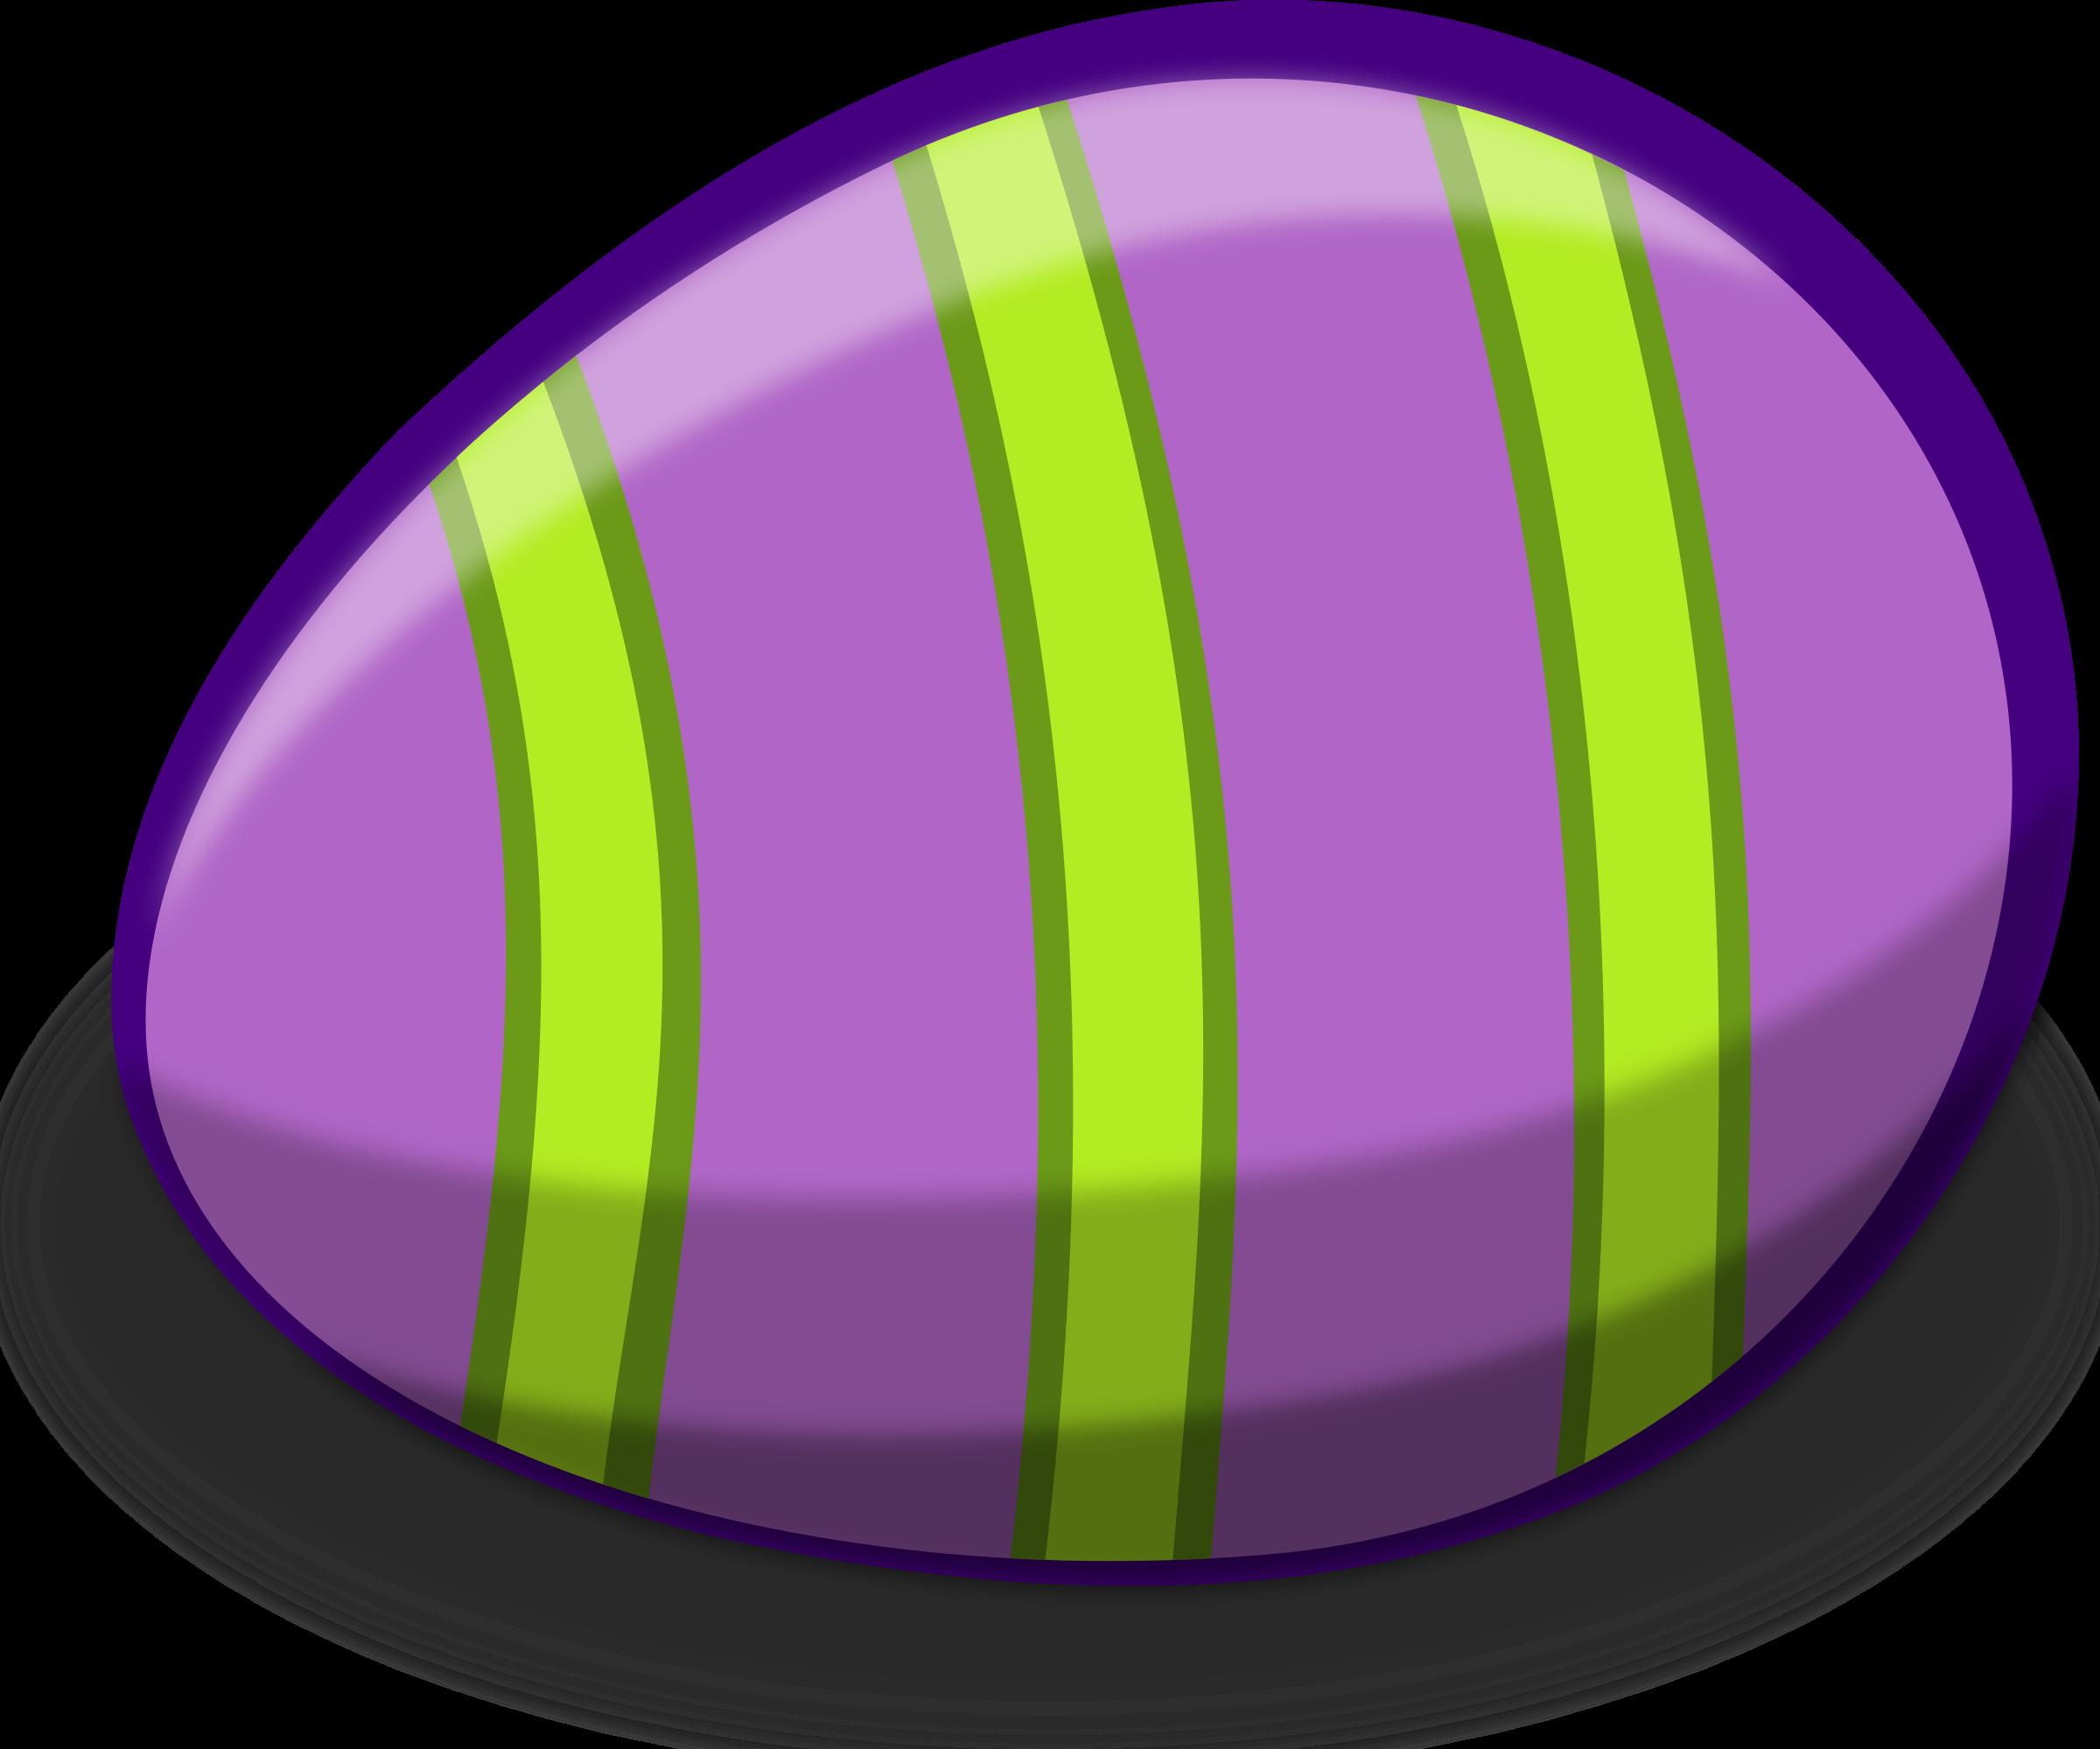 Easter egg vector clipart jpg download Purple Striped Easter Egg, Vector Clipart image - Free stock photo ... jpg download